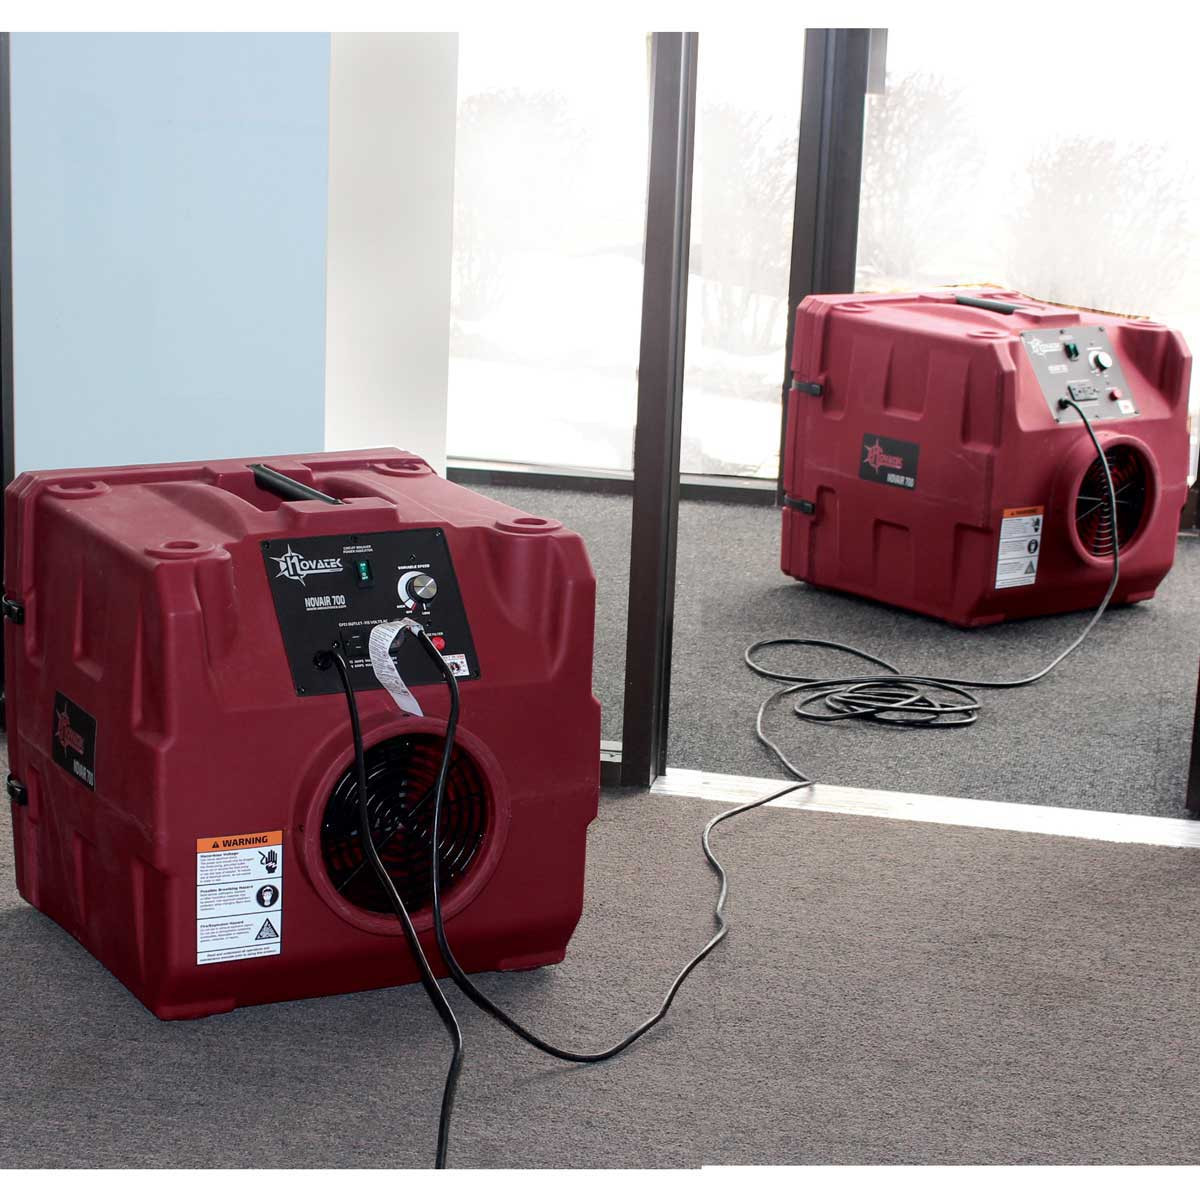 F0700 Novair 700 Air Purifier with Hepa Filter